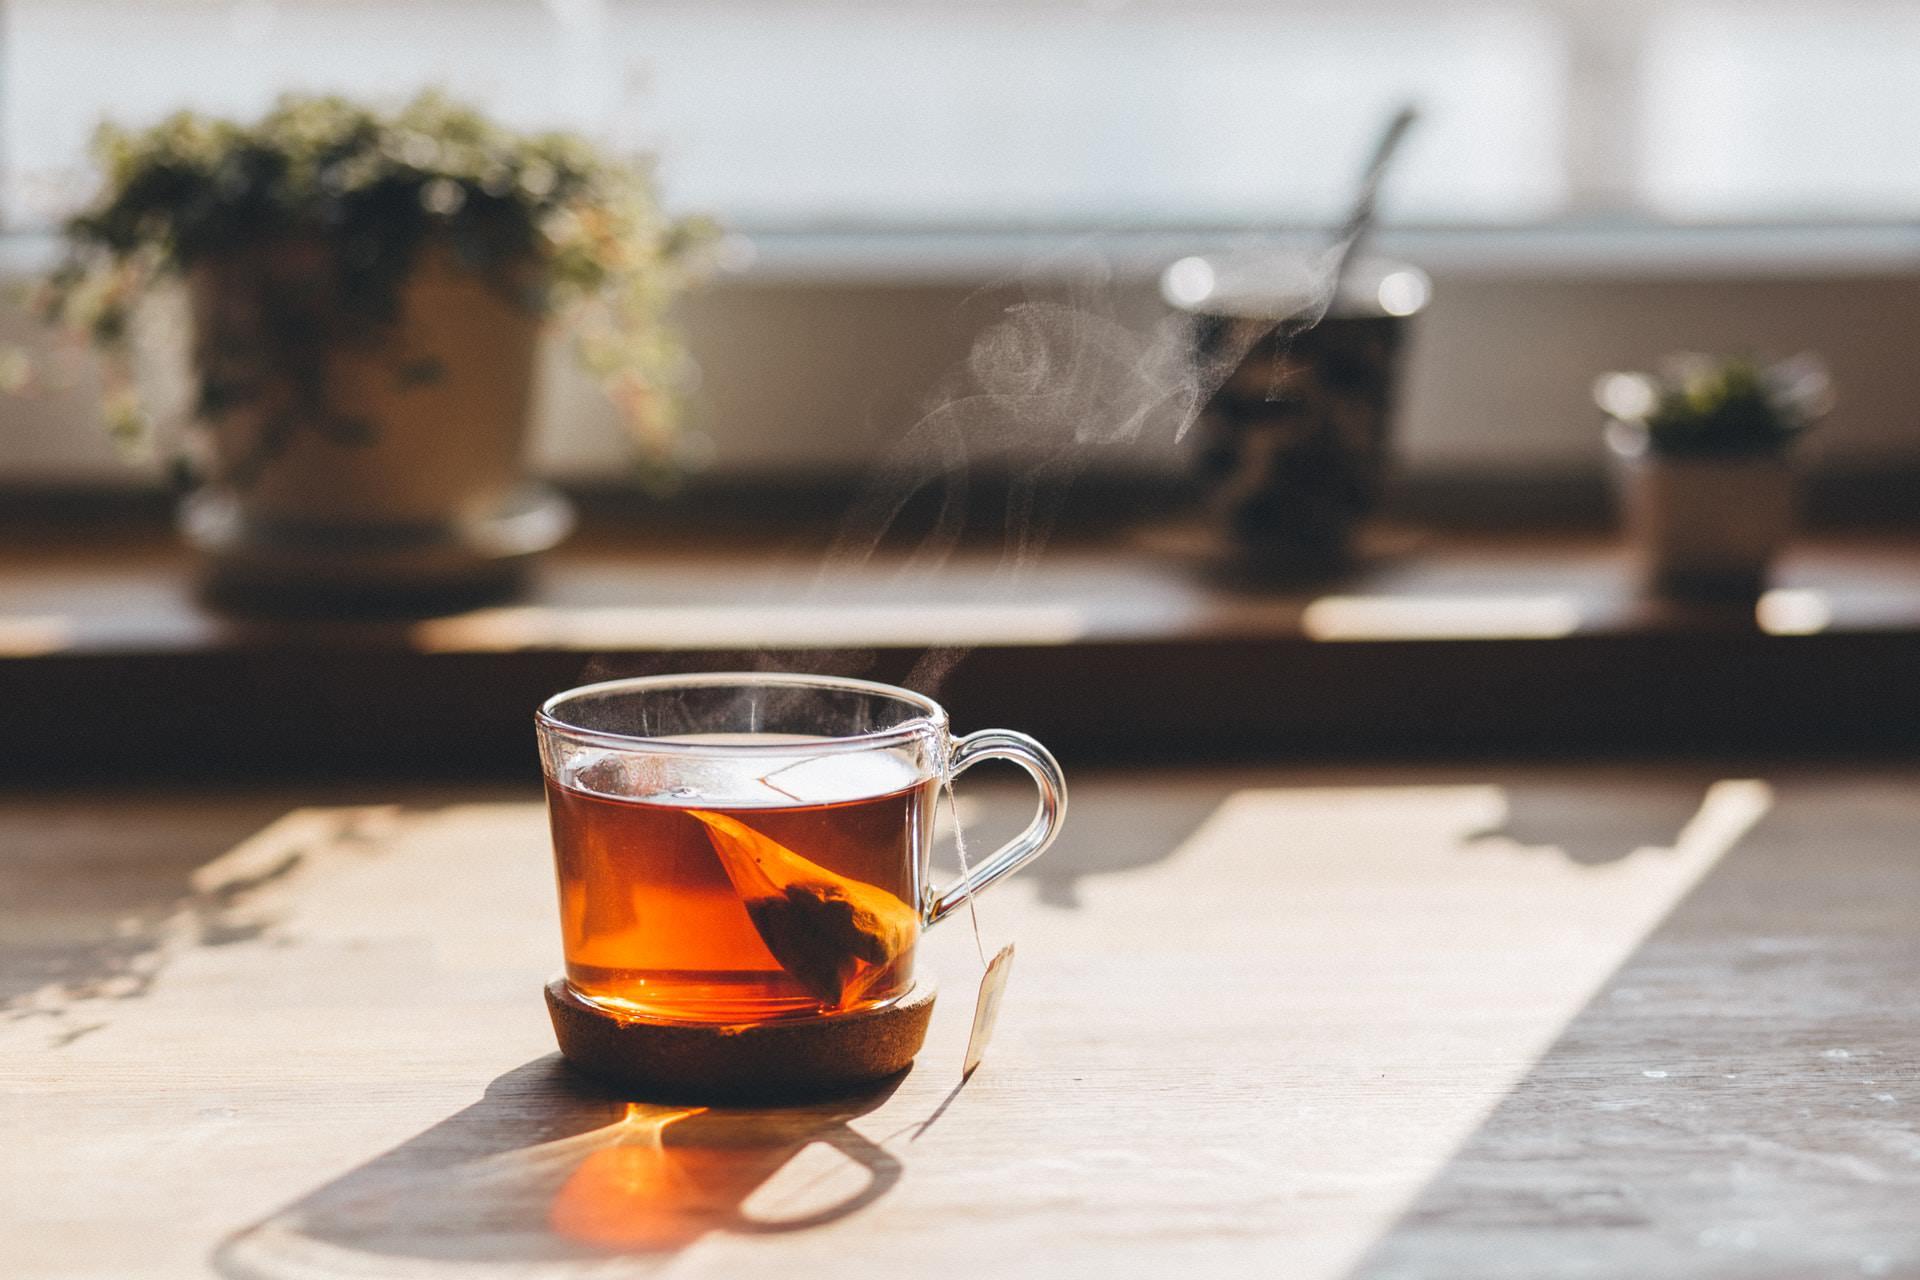 cup of earl grey tea